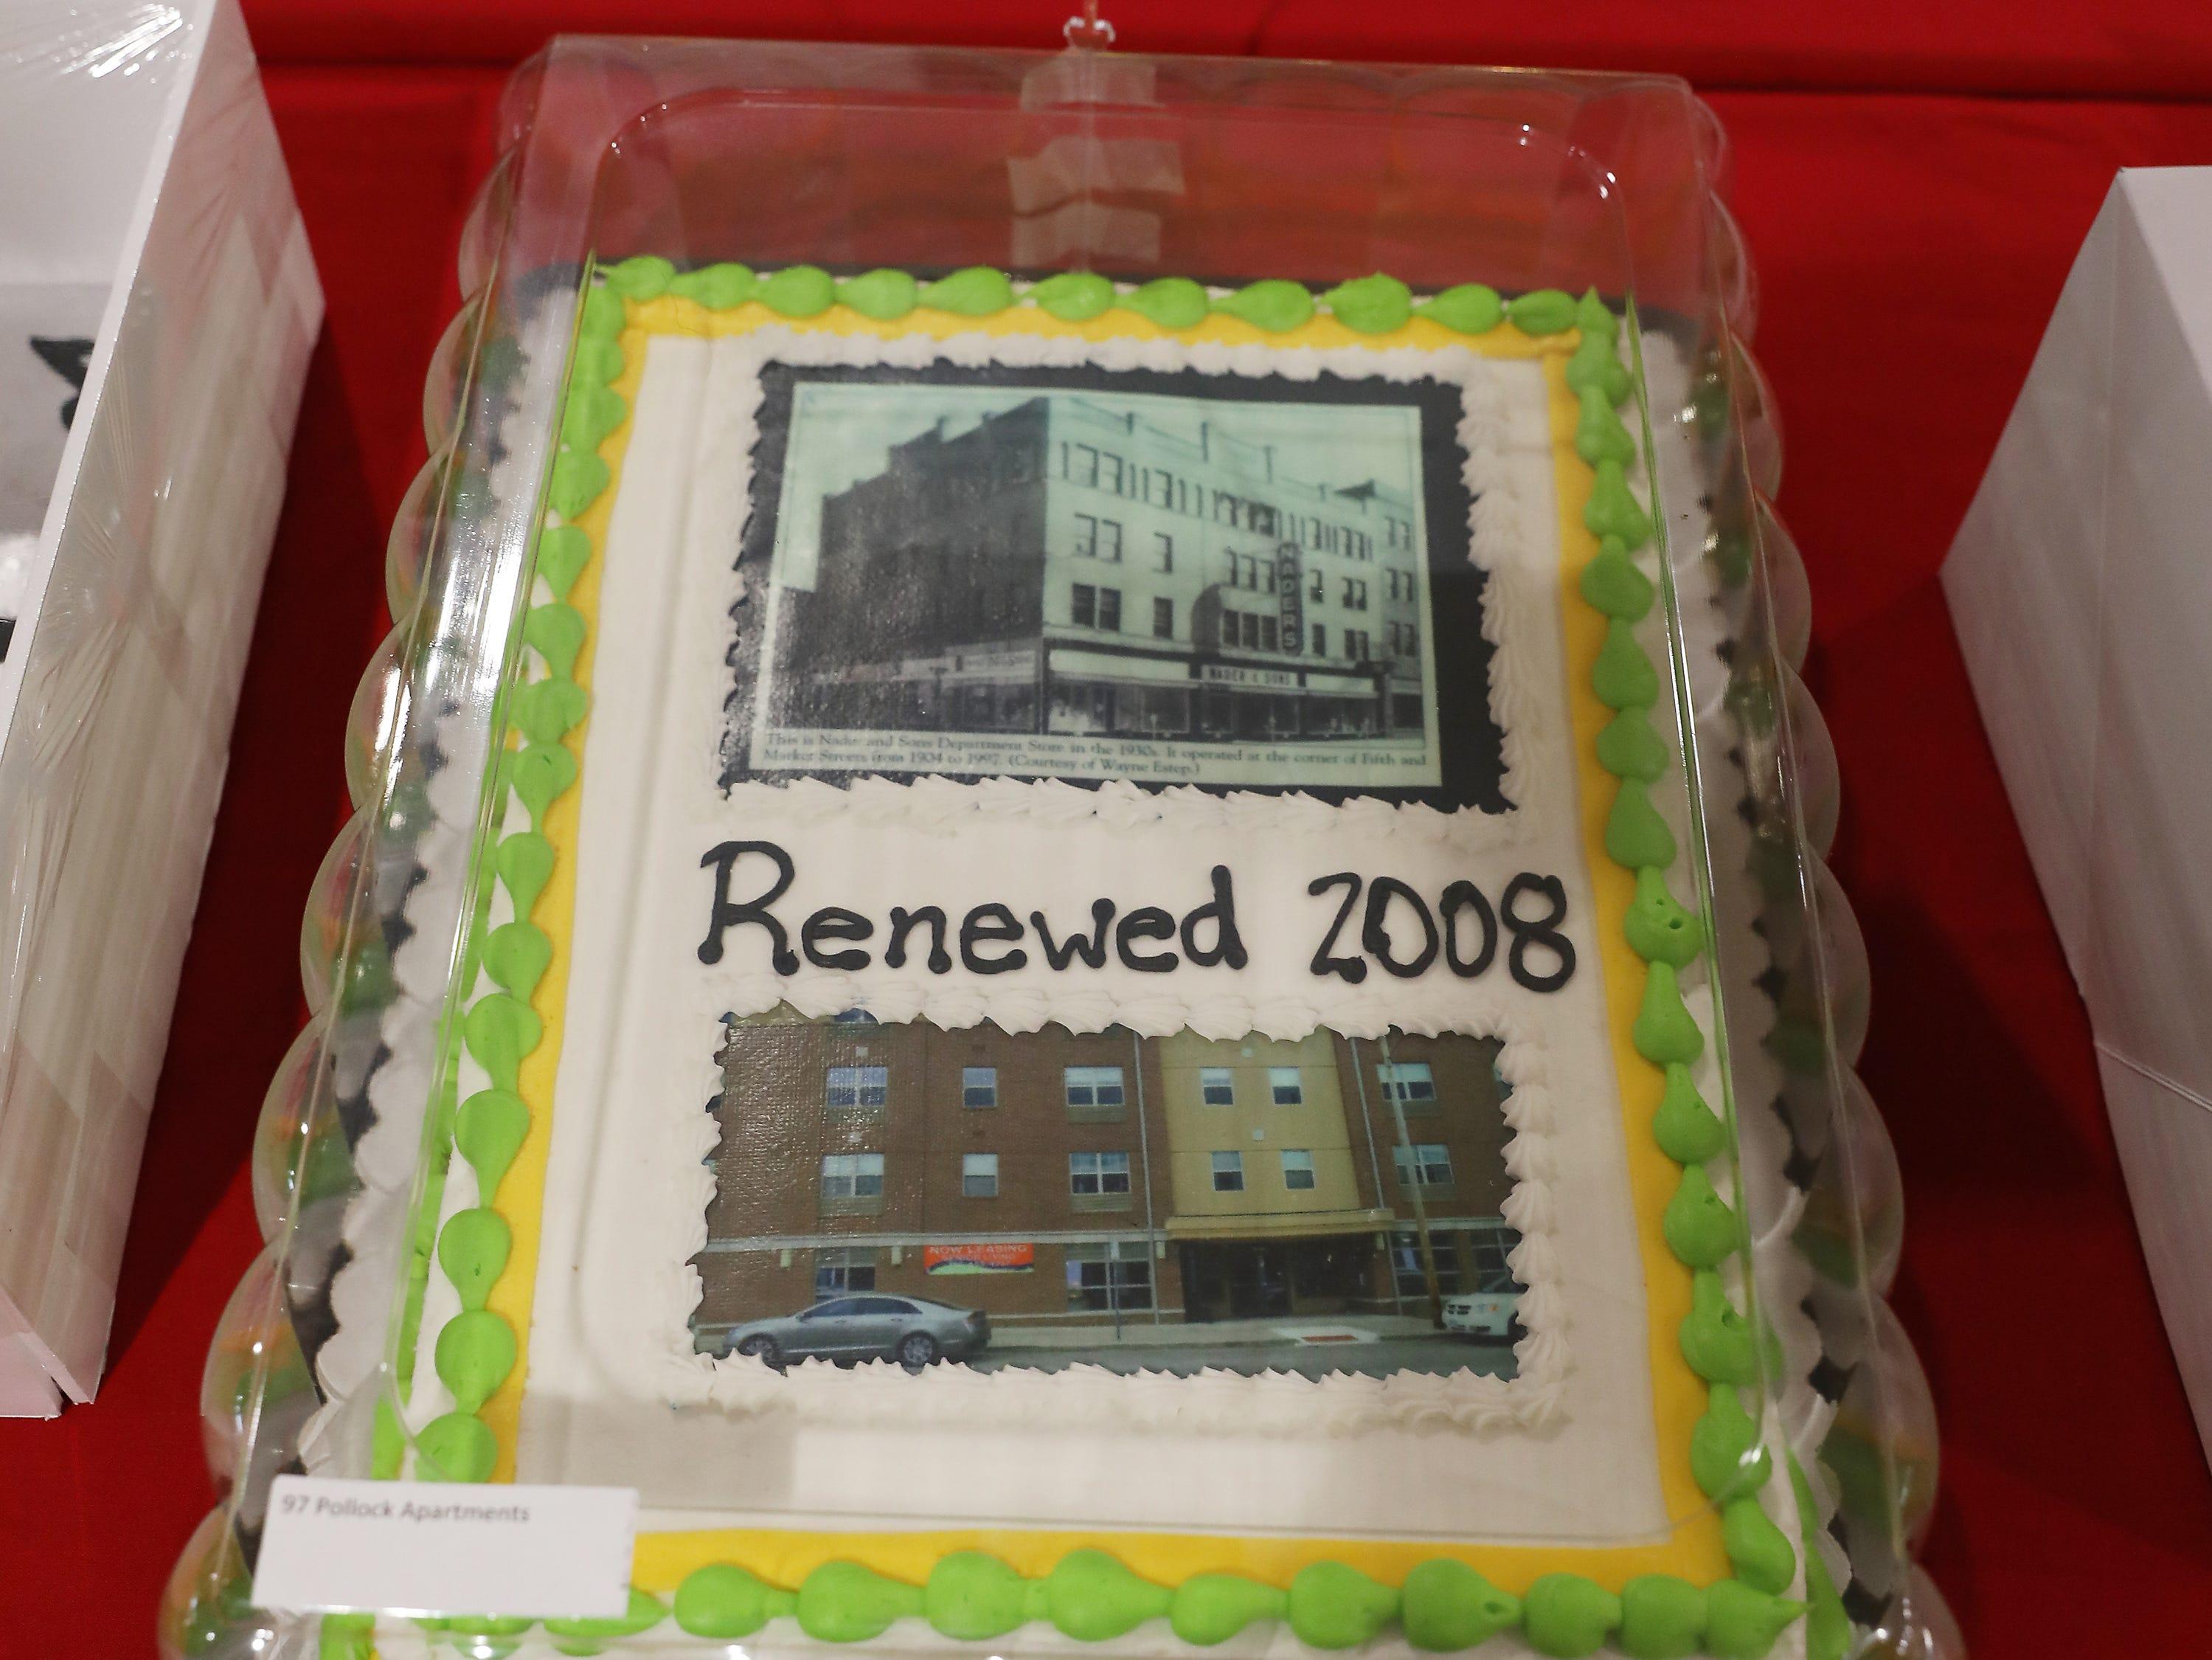 1:00 P.M. Thursday cake 97 Pollock Apartments